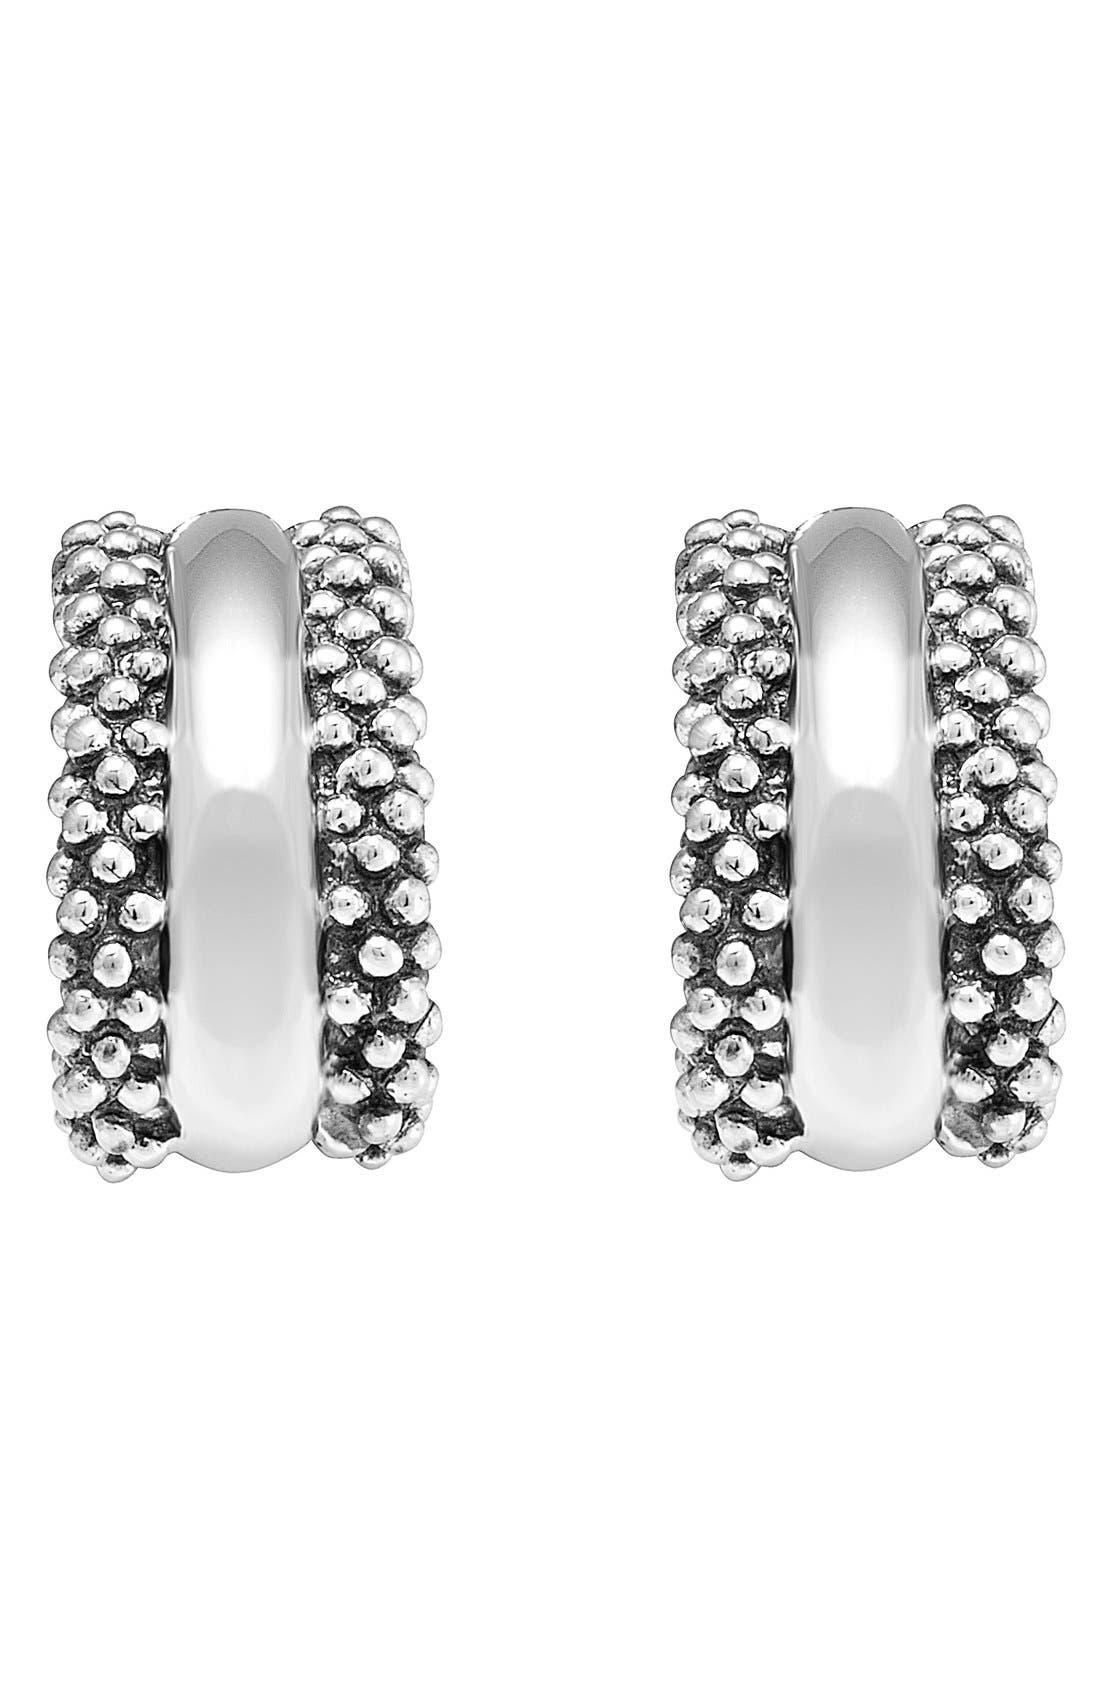 Caviar<sup>™</sup> Sterling Silver Hoop Earrings,                             Alternate thumbnail 2, color,                             Sterling Silver